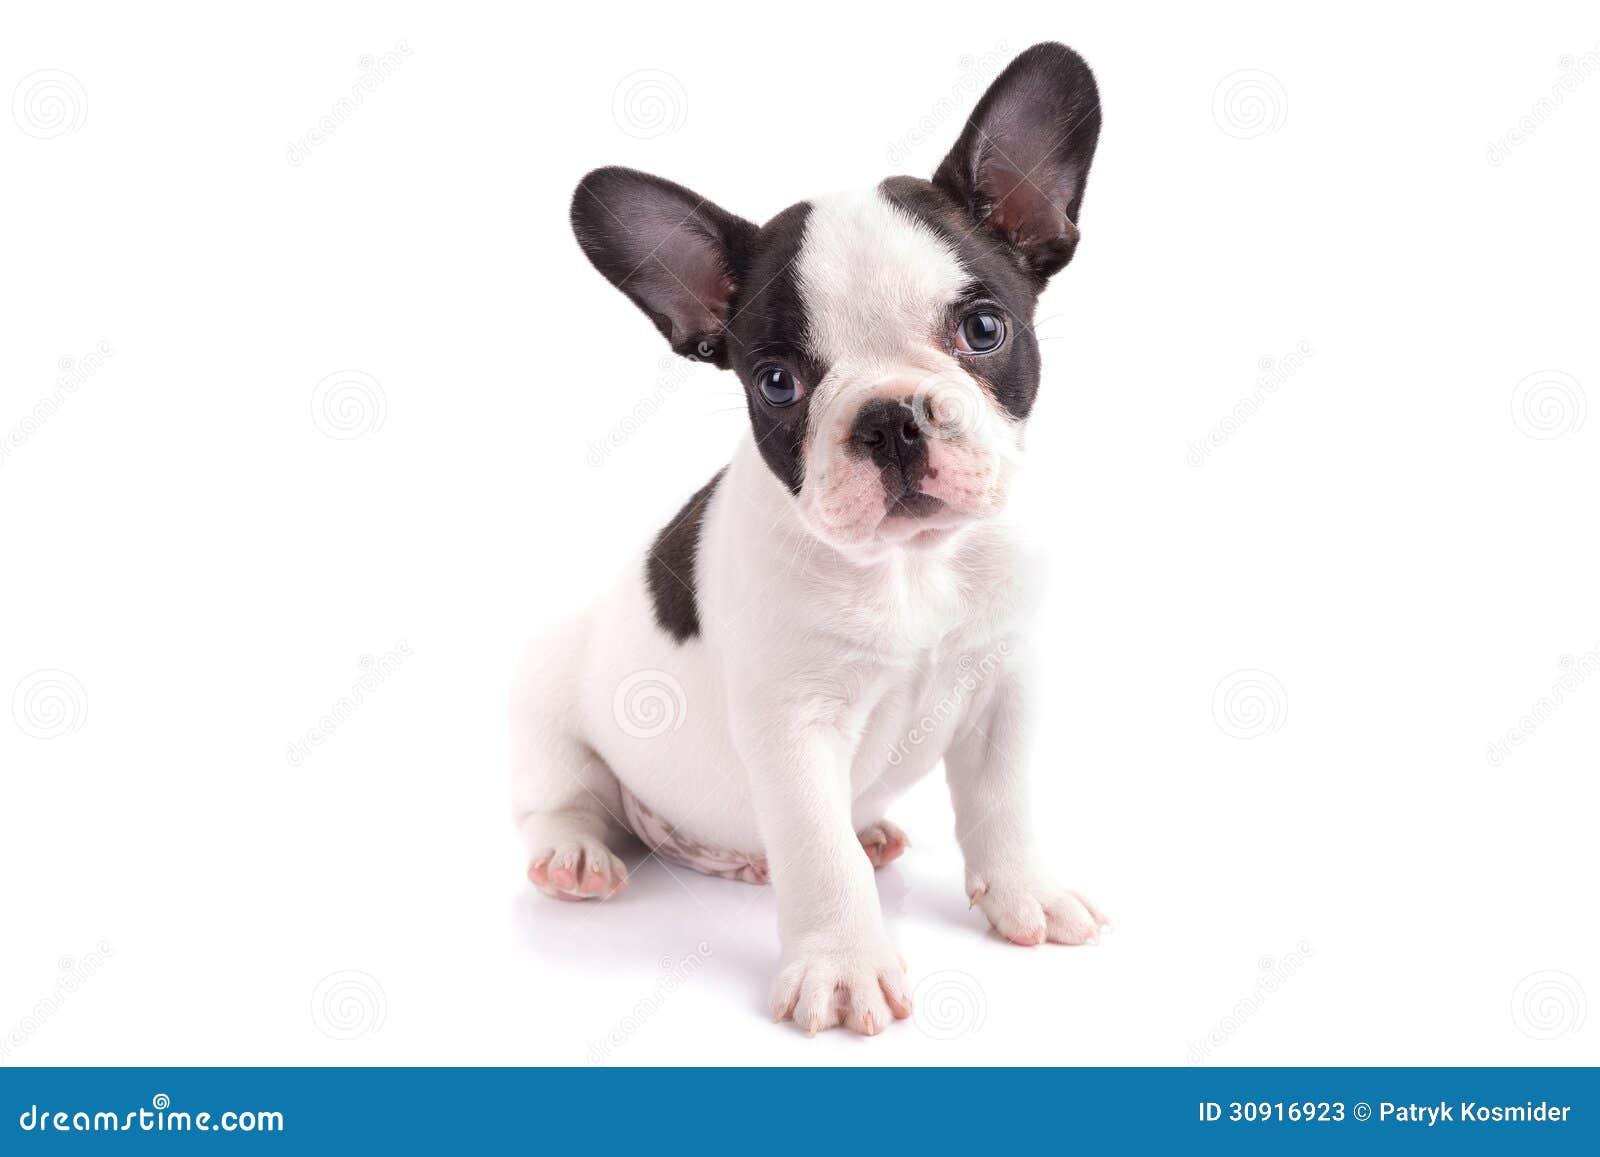 Portrait Of French Bulldog Puppy Stock Photos - Image: 30916923 White Baby French Bulldog